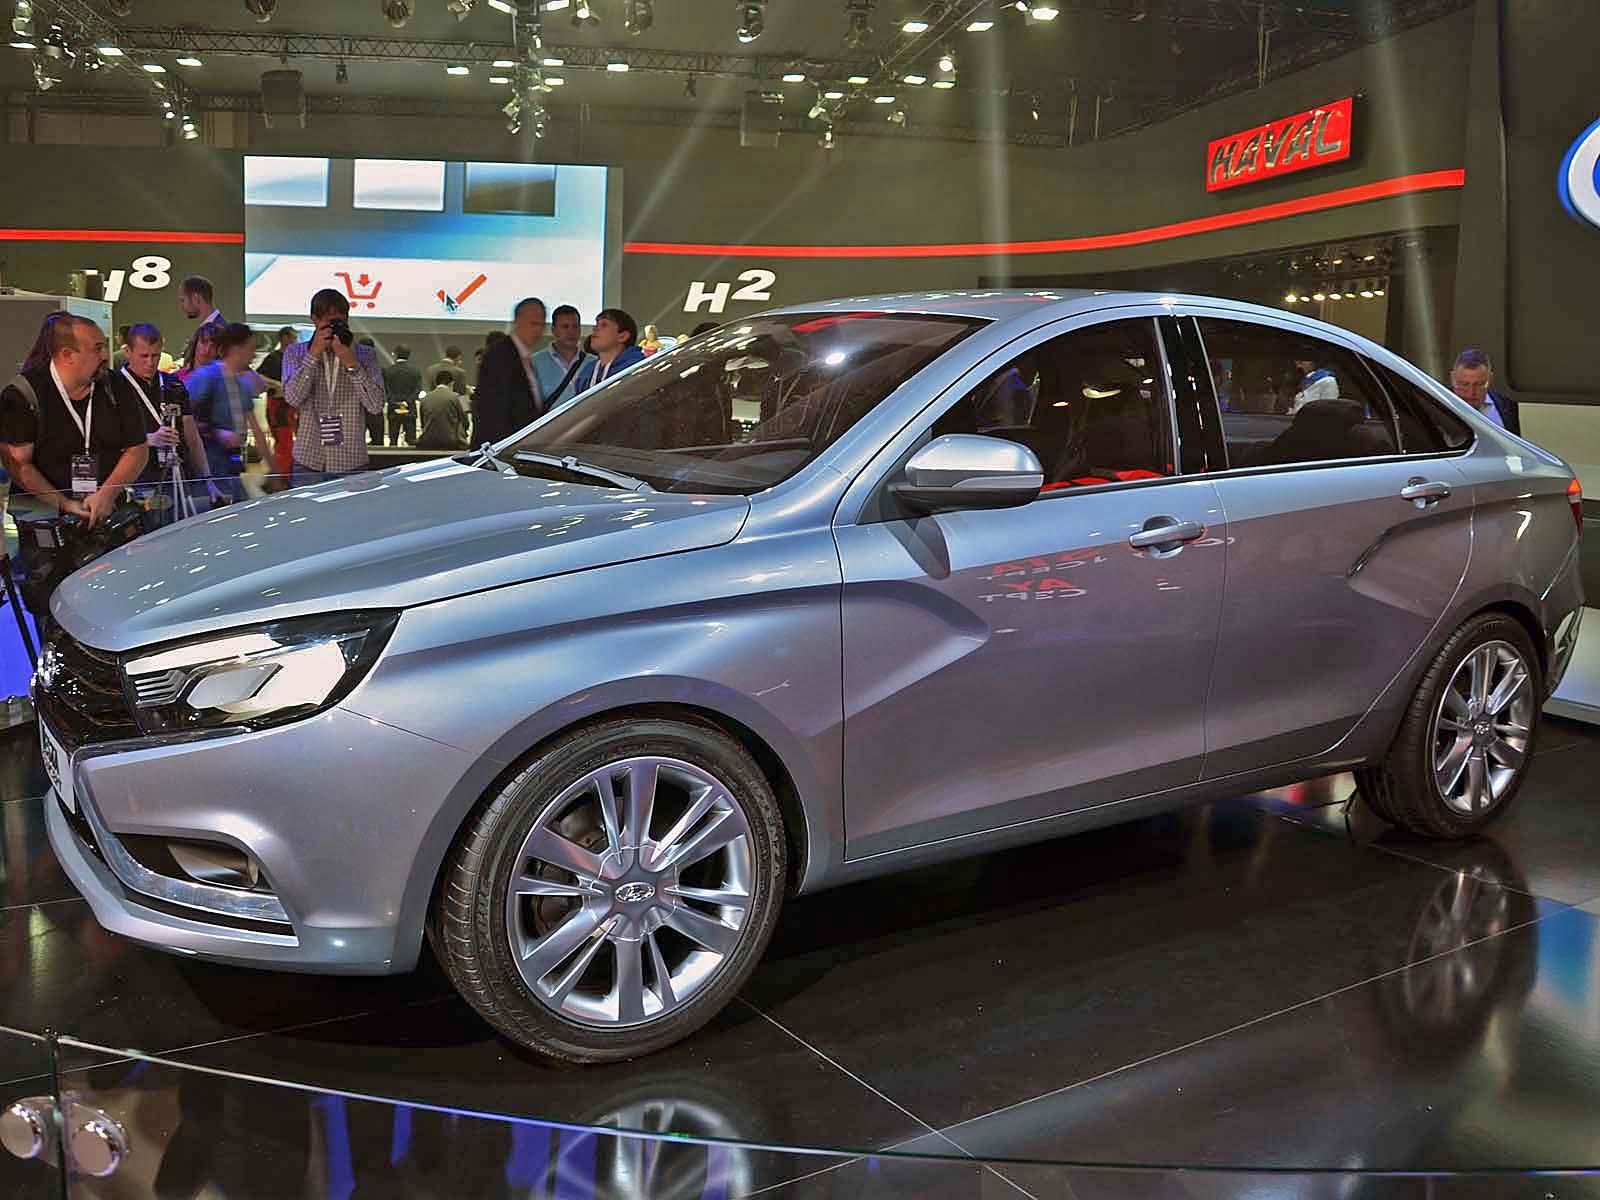 Новинка АВТОВАЗа Lada Vesta встанет на конвейер ровно через год - журнал За рулем